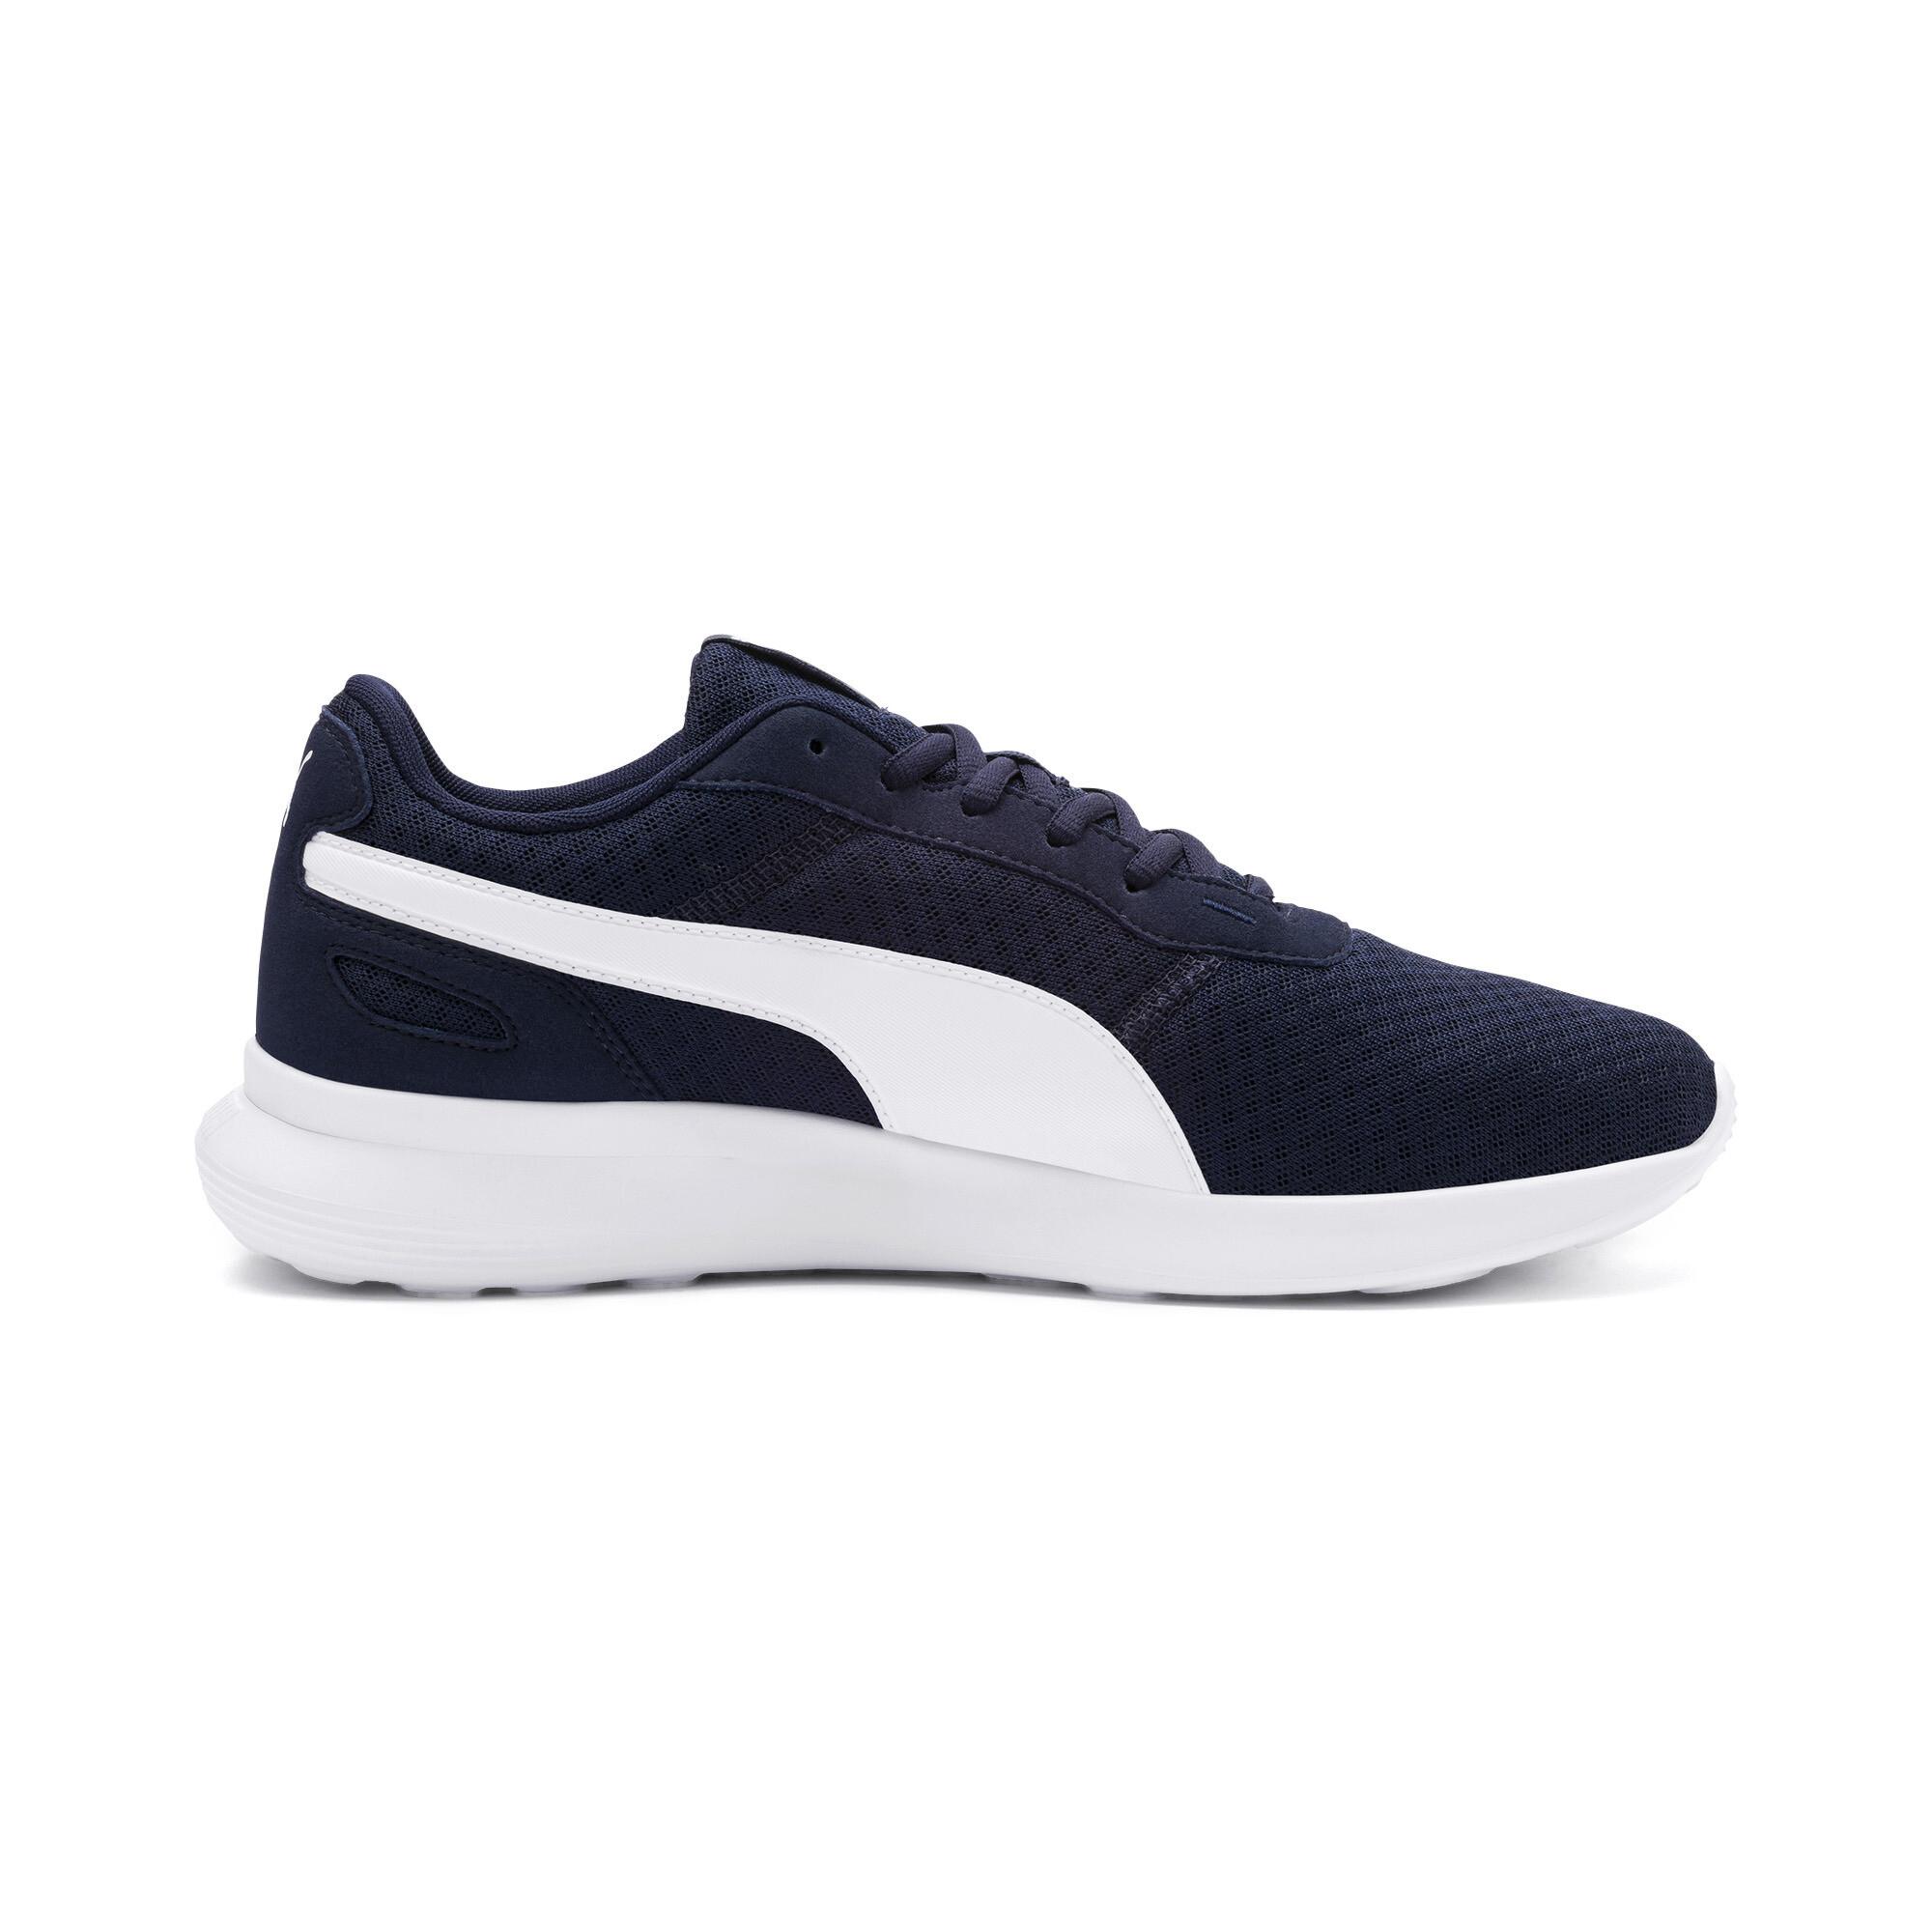 PUMA-Men-039-s-ST-Activate-Sneakers thumbnail 22